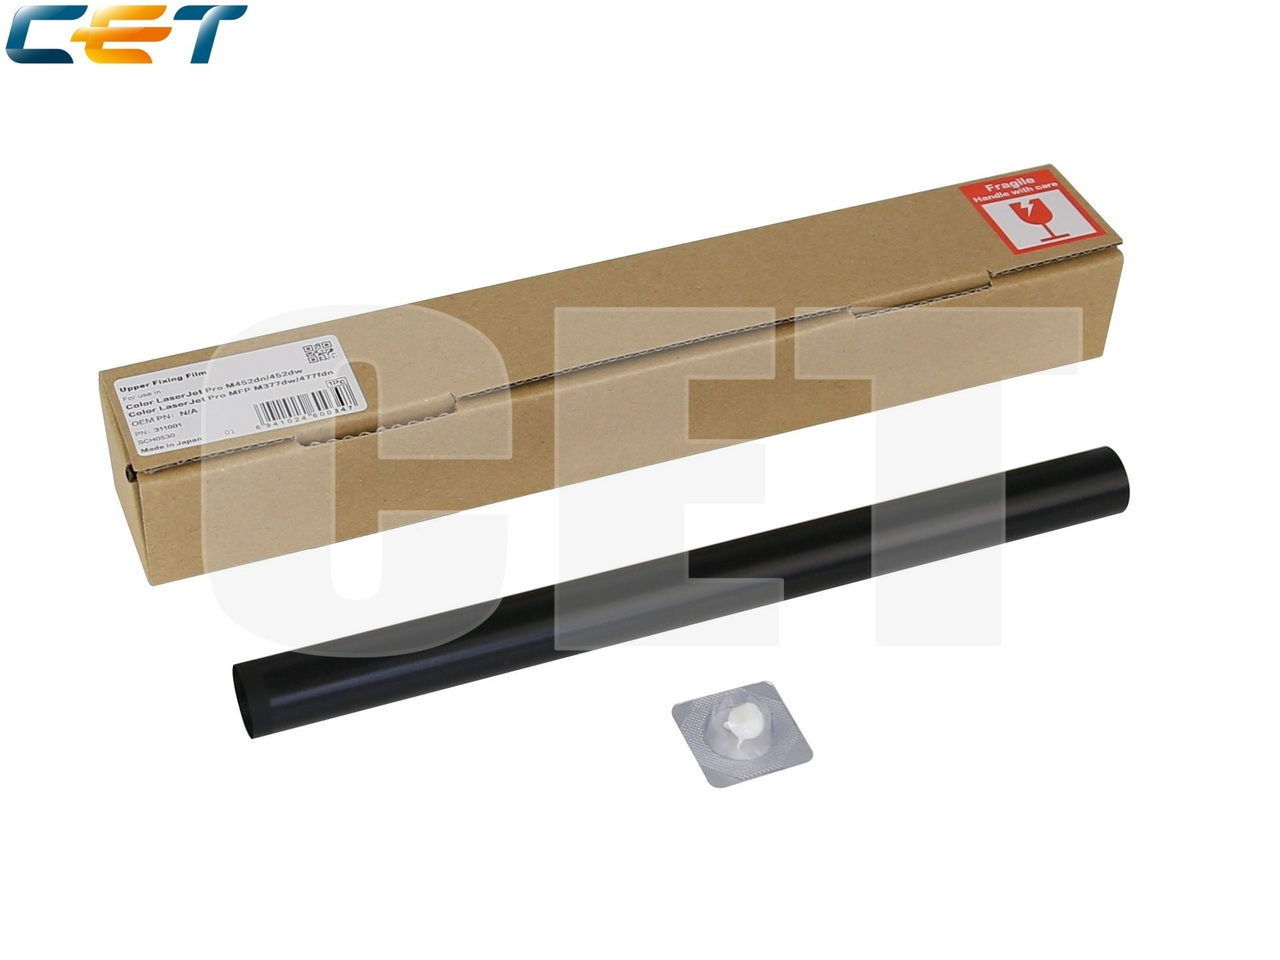 Термопленка (Upper) для HP Color LaserJet Pro M452dn/MFPM377dw/477fdn (CET), CET311001